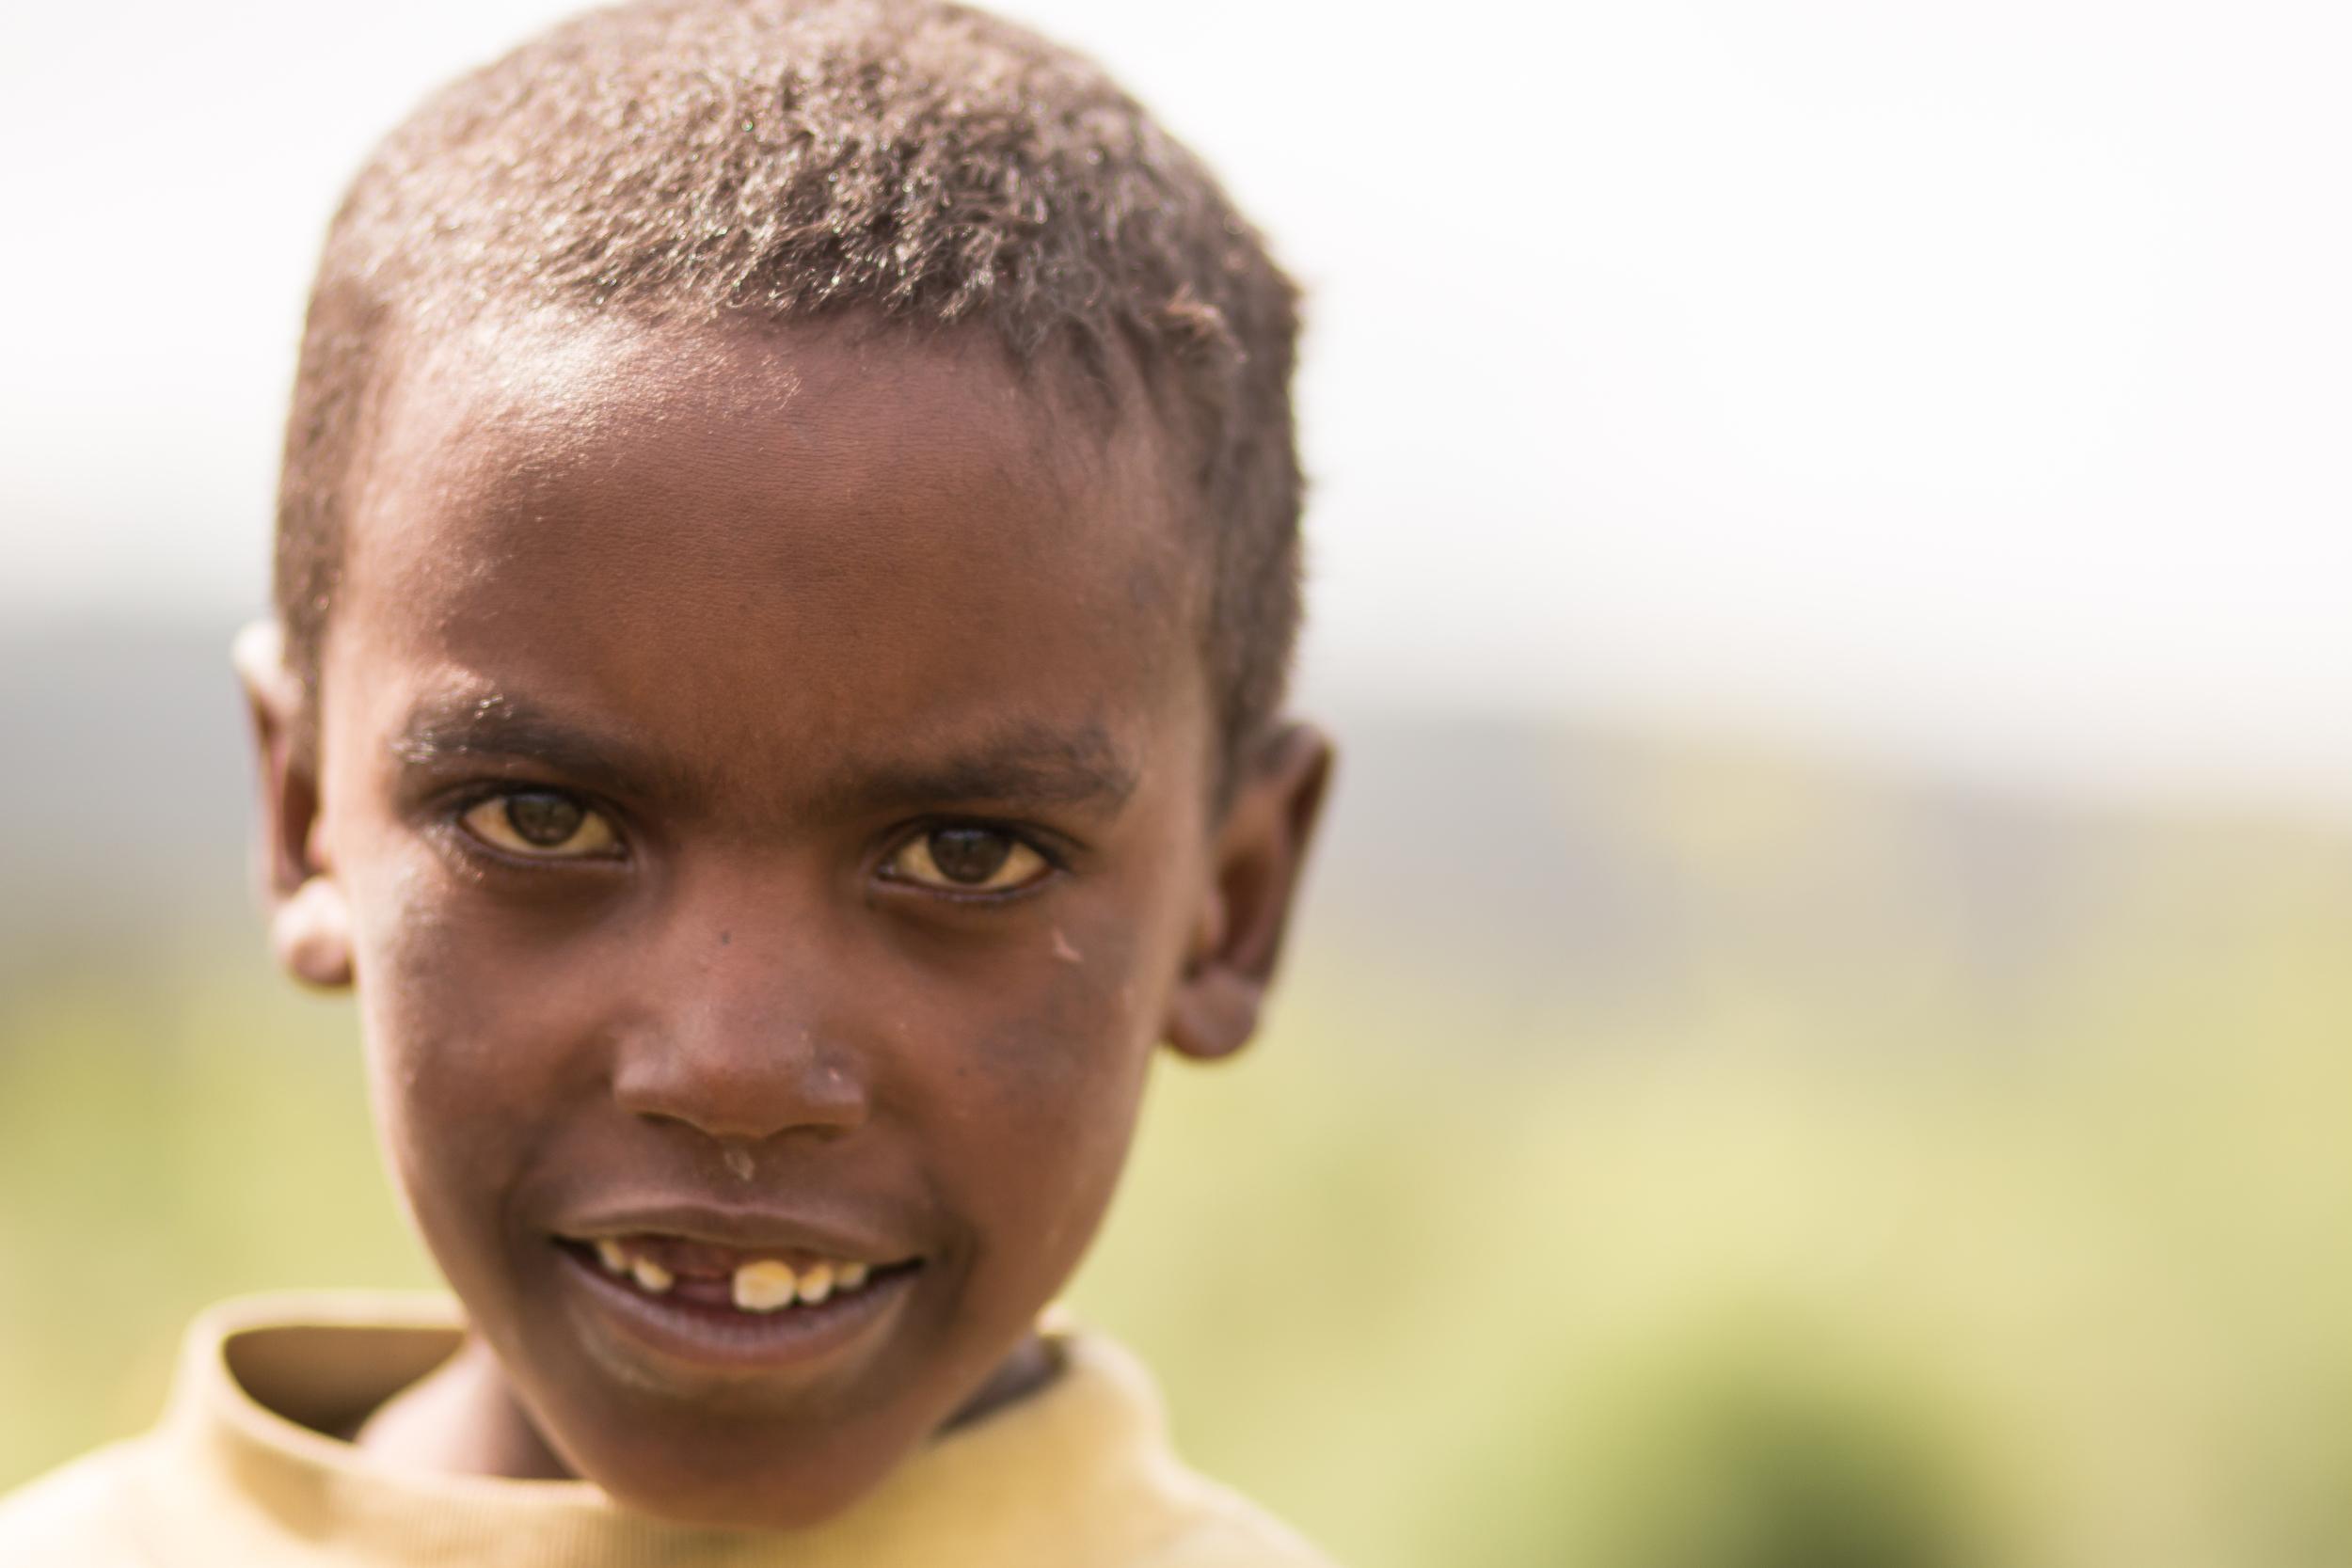 ethiopia_portraits-8968.JPG